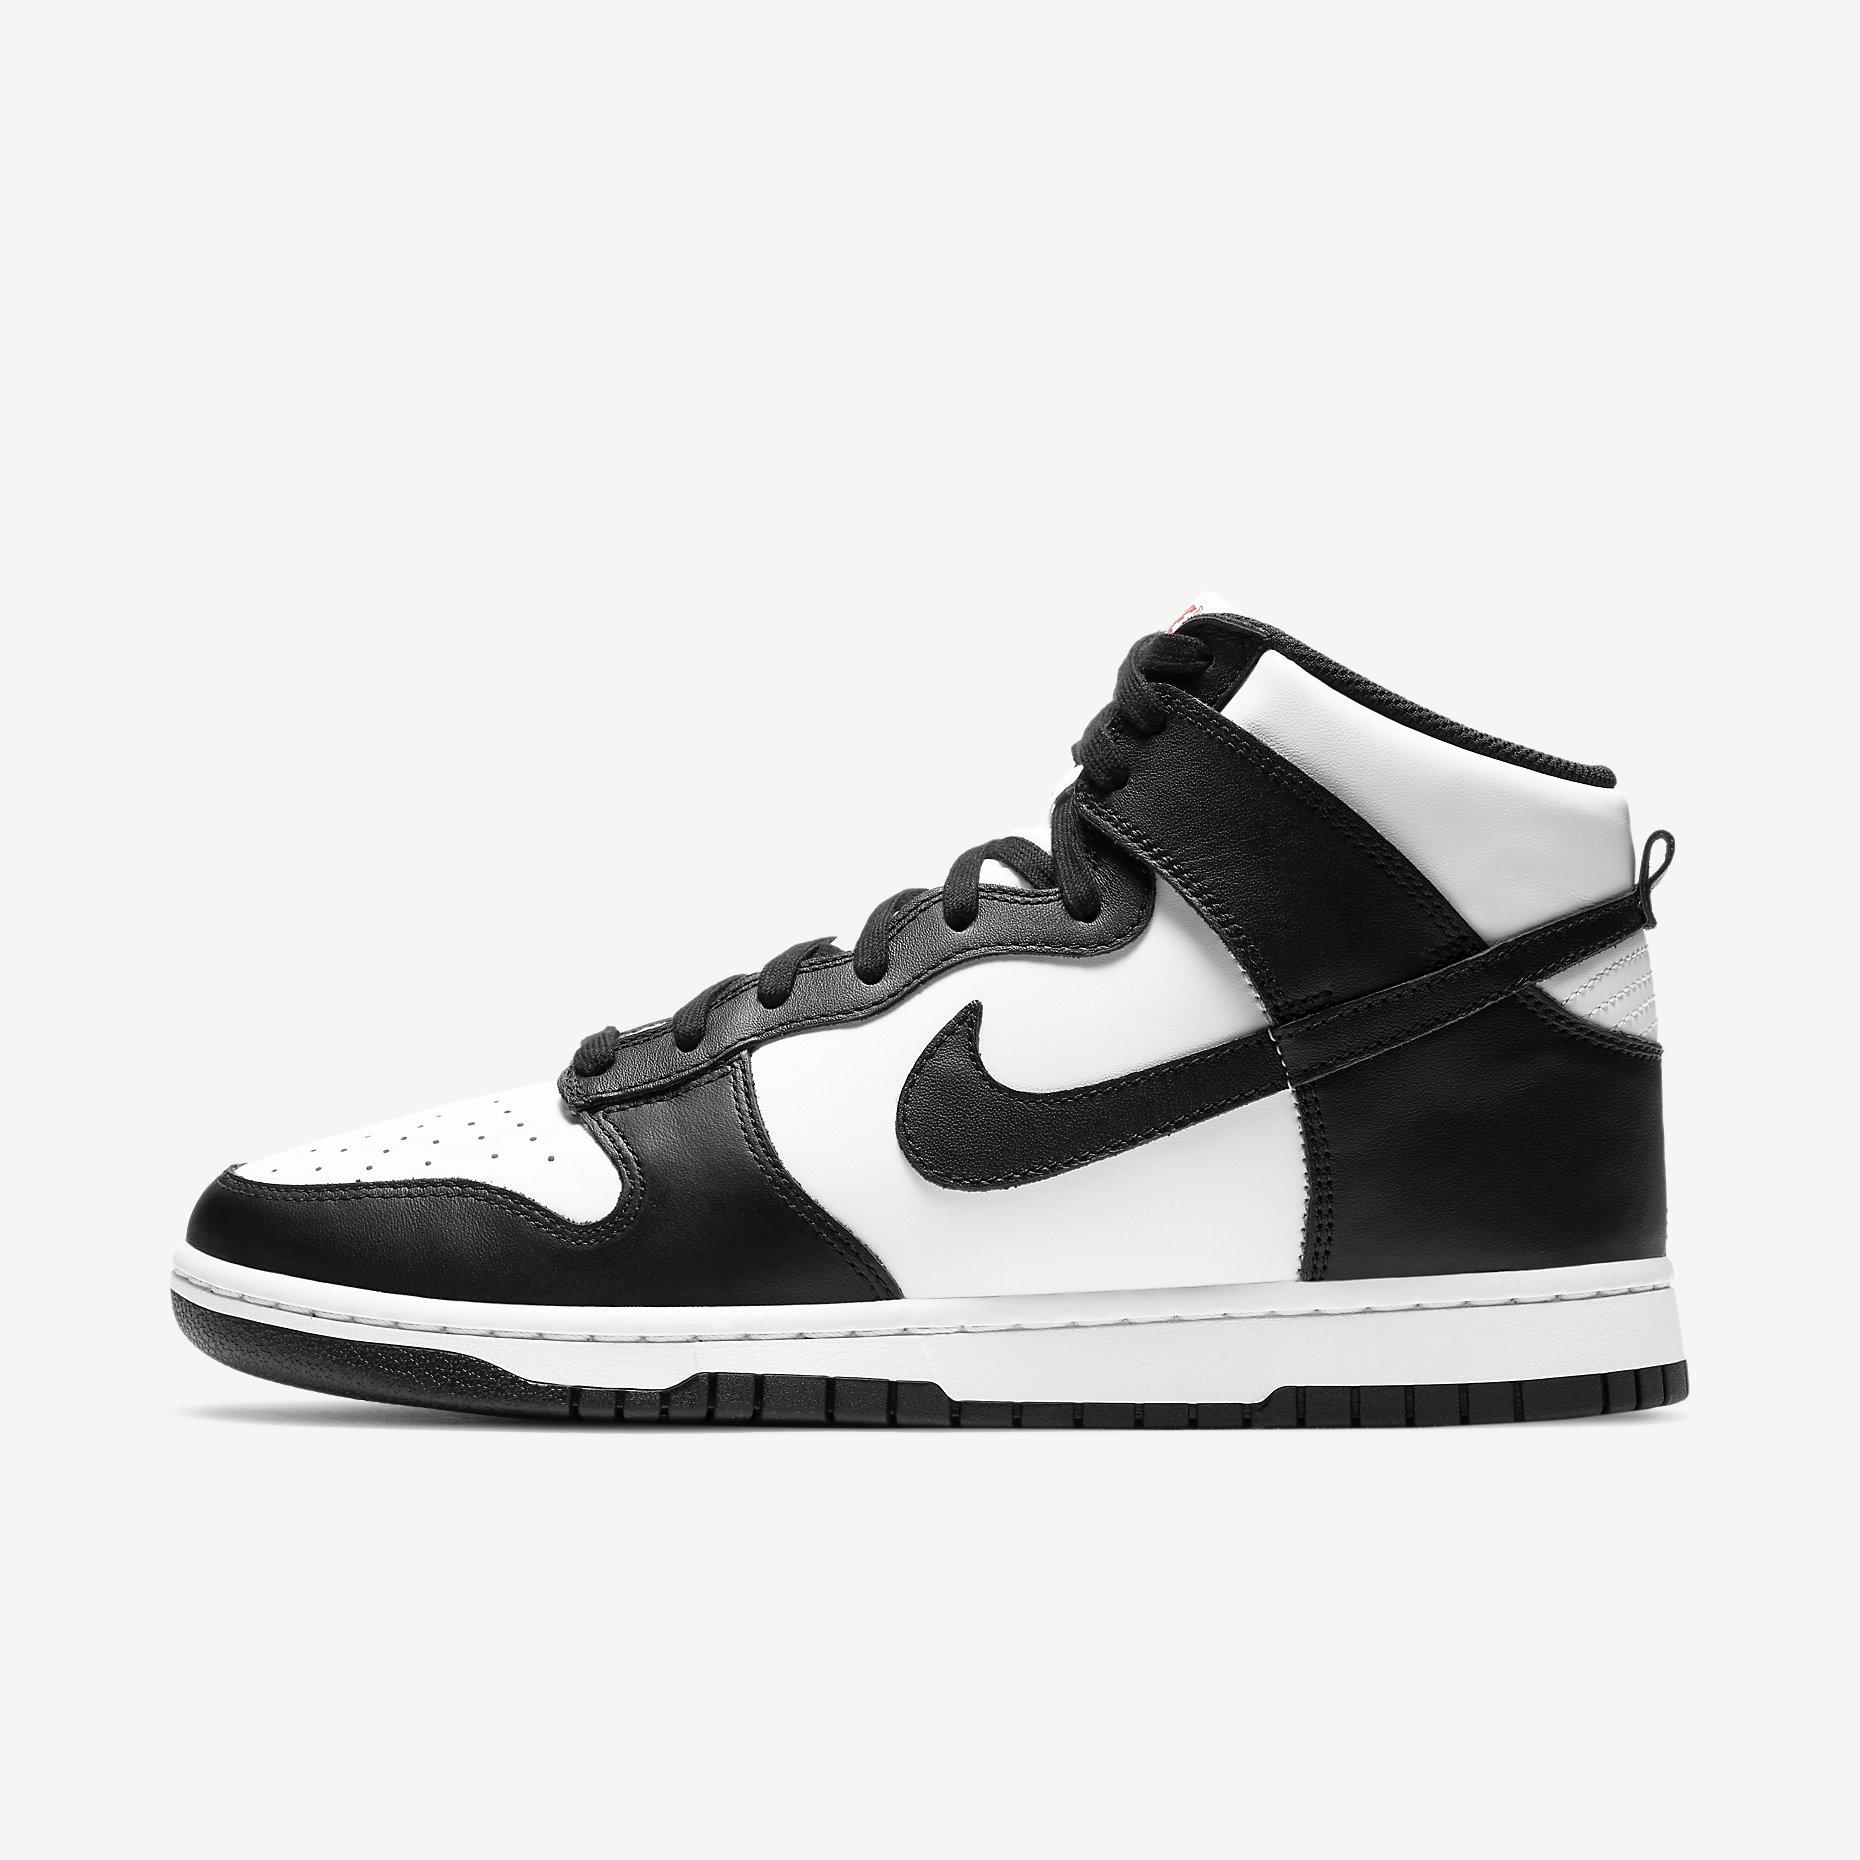 Nike Dunk High Retro 'White/Black'}